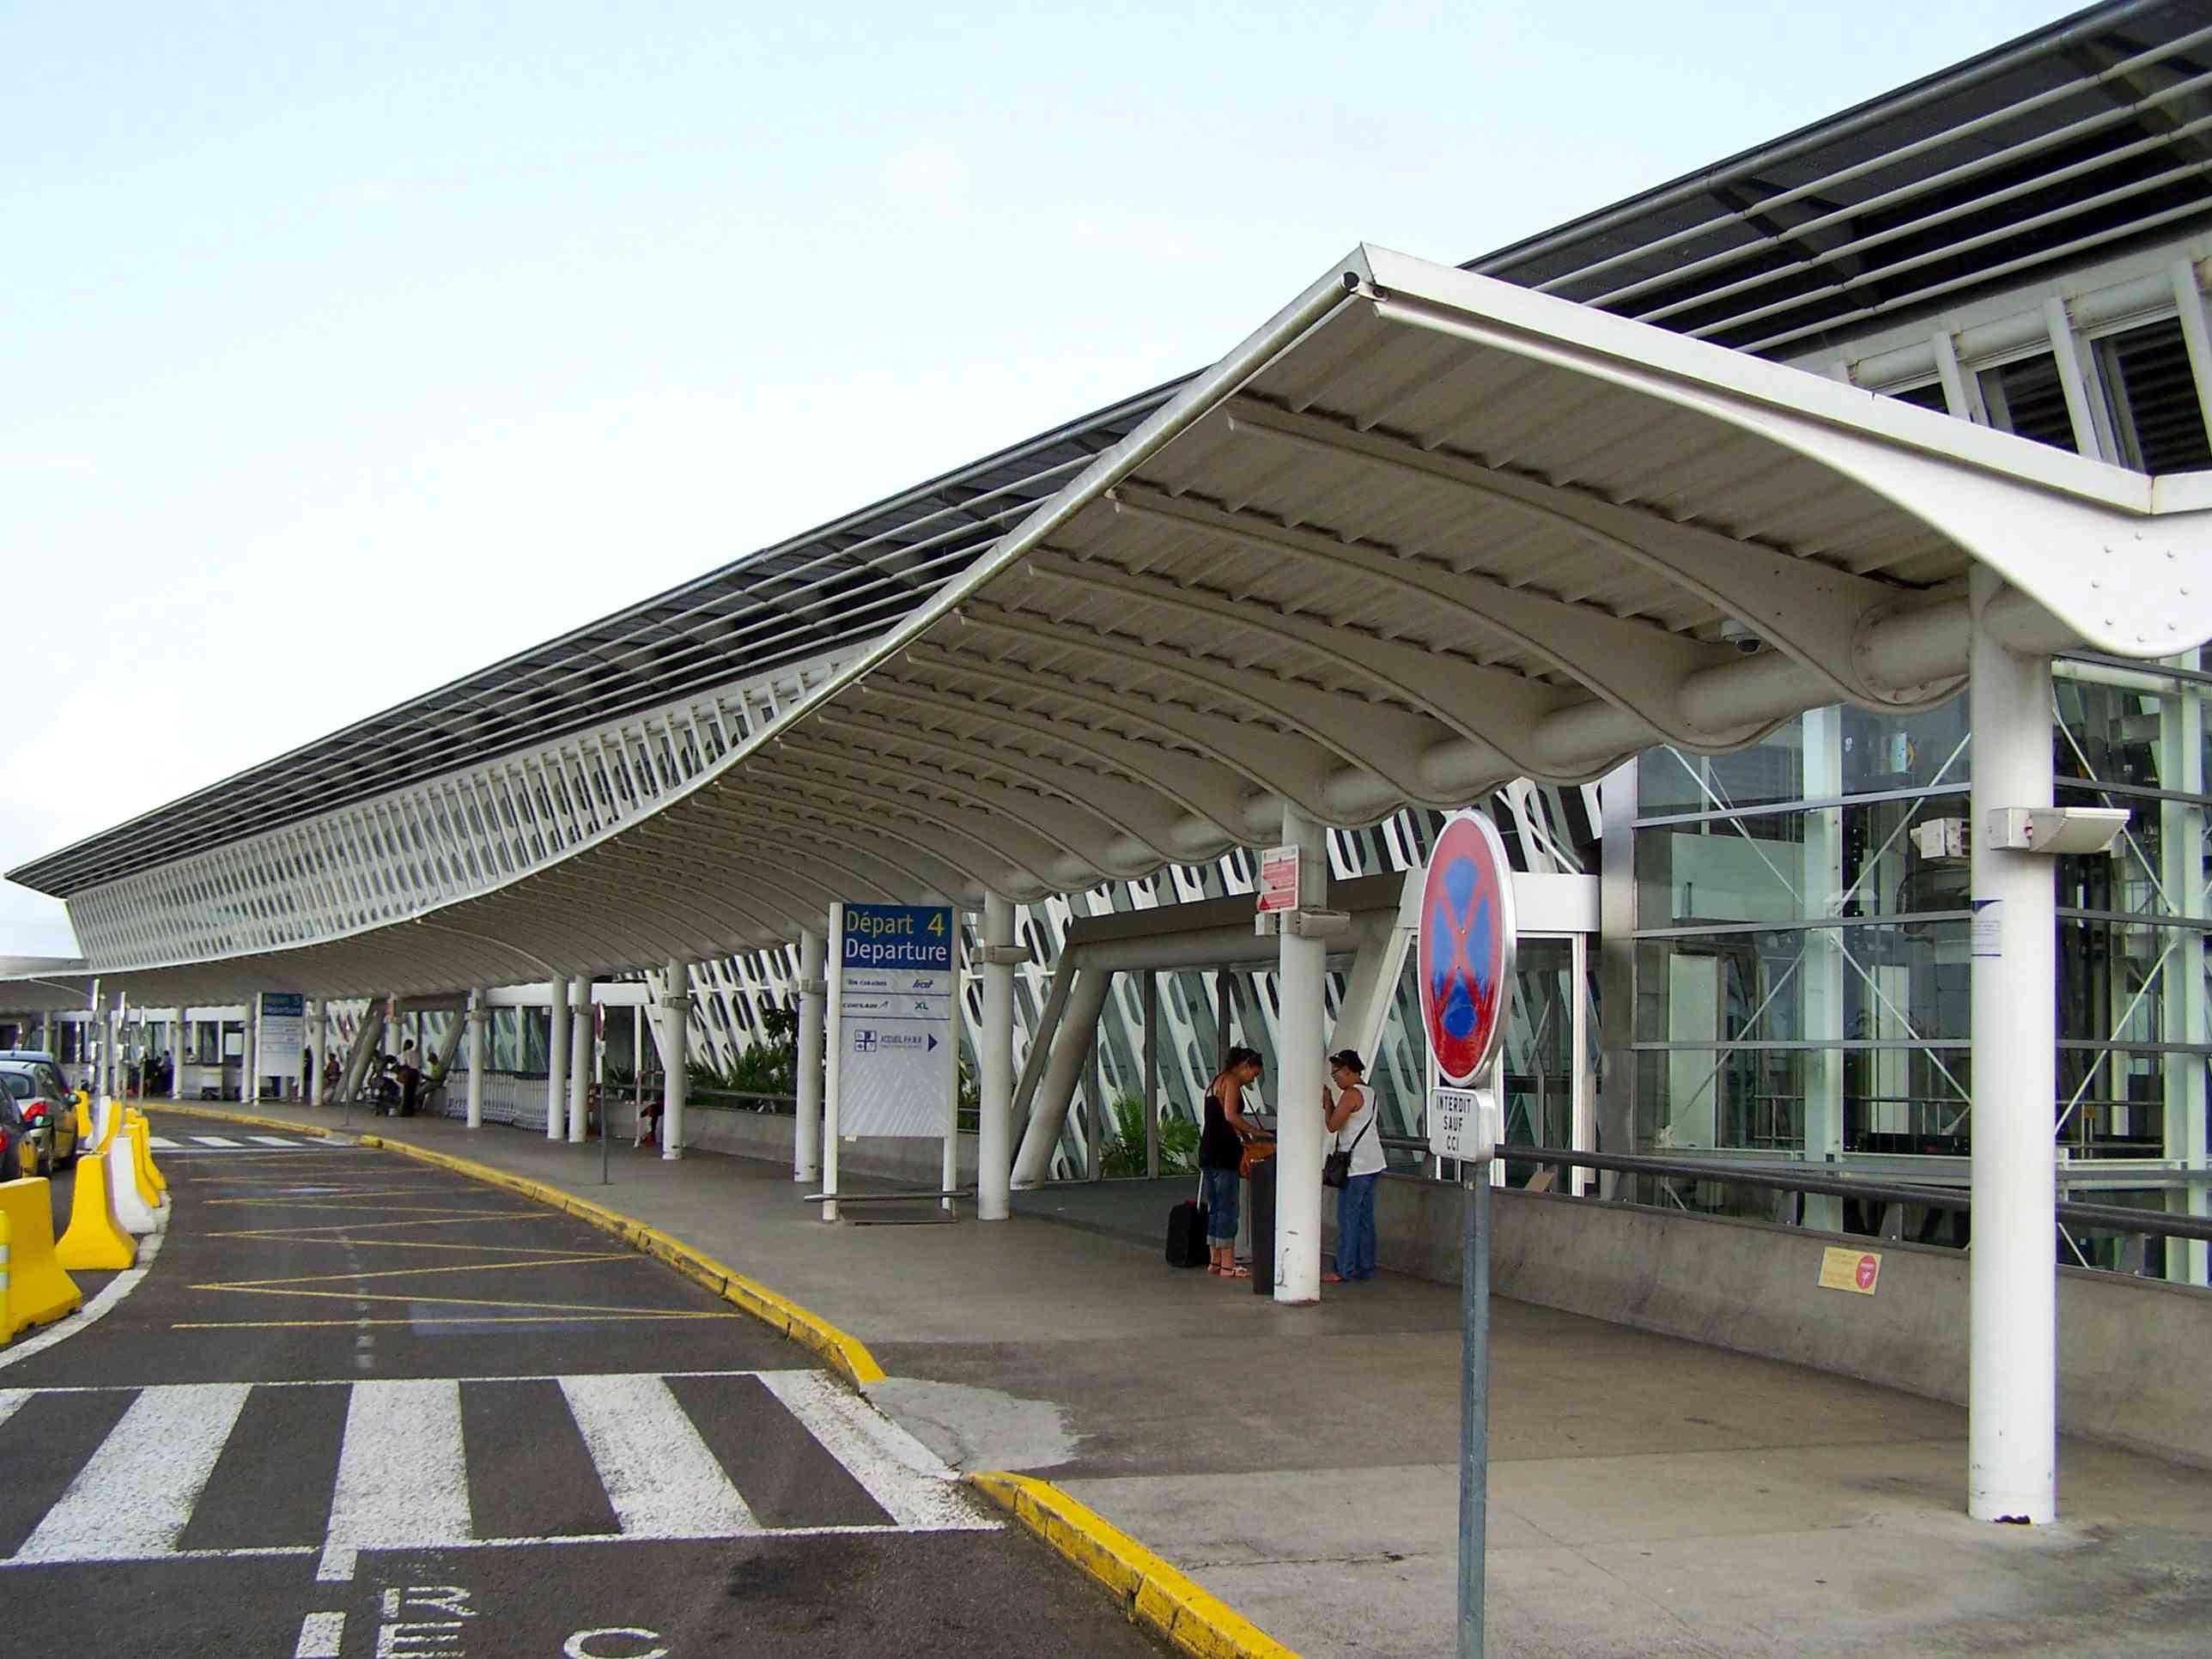 Pointe-á-Pitre International Airport